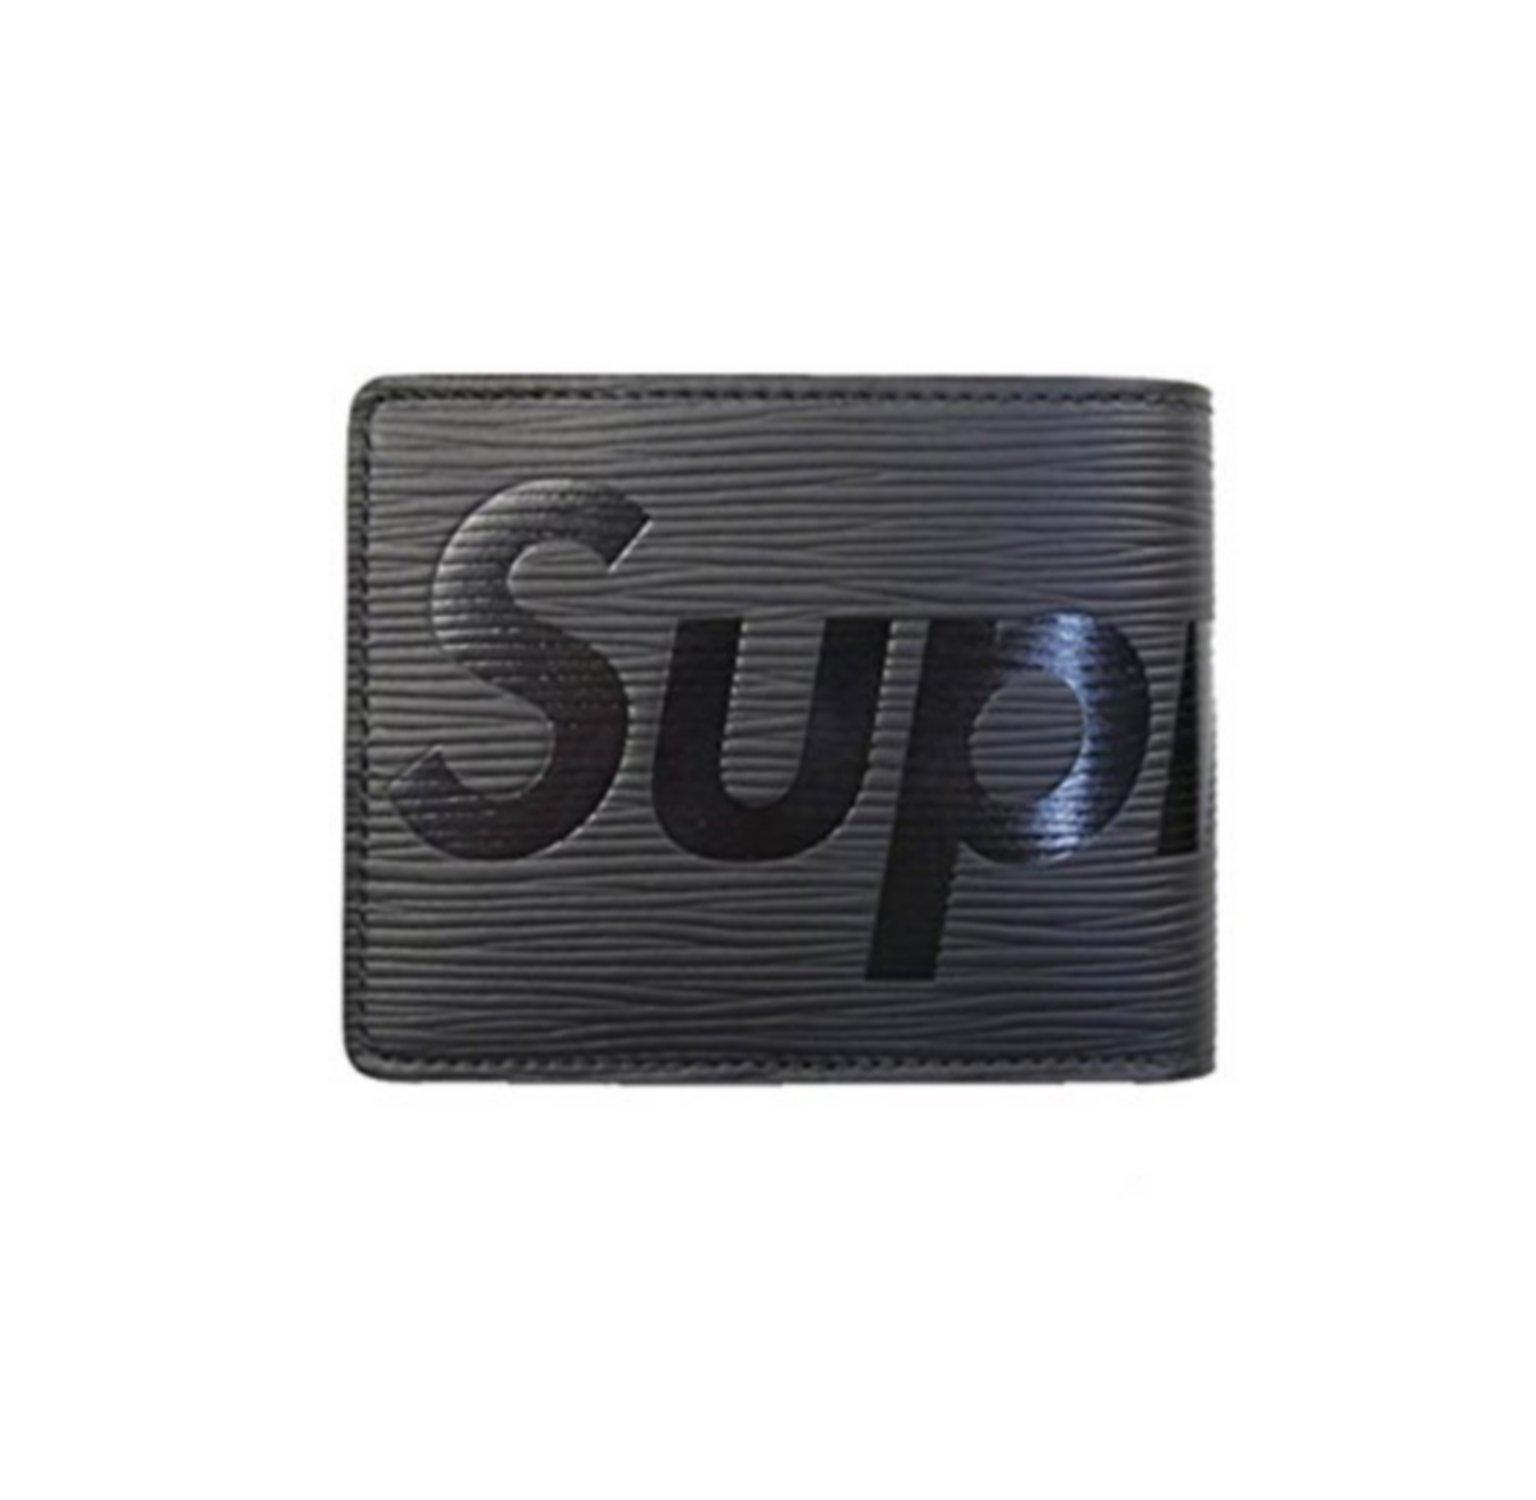 SUPREME&LV Men and women wallets/purse/Short wallet (black)